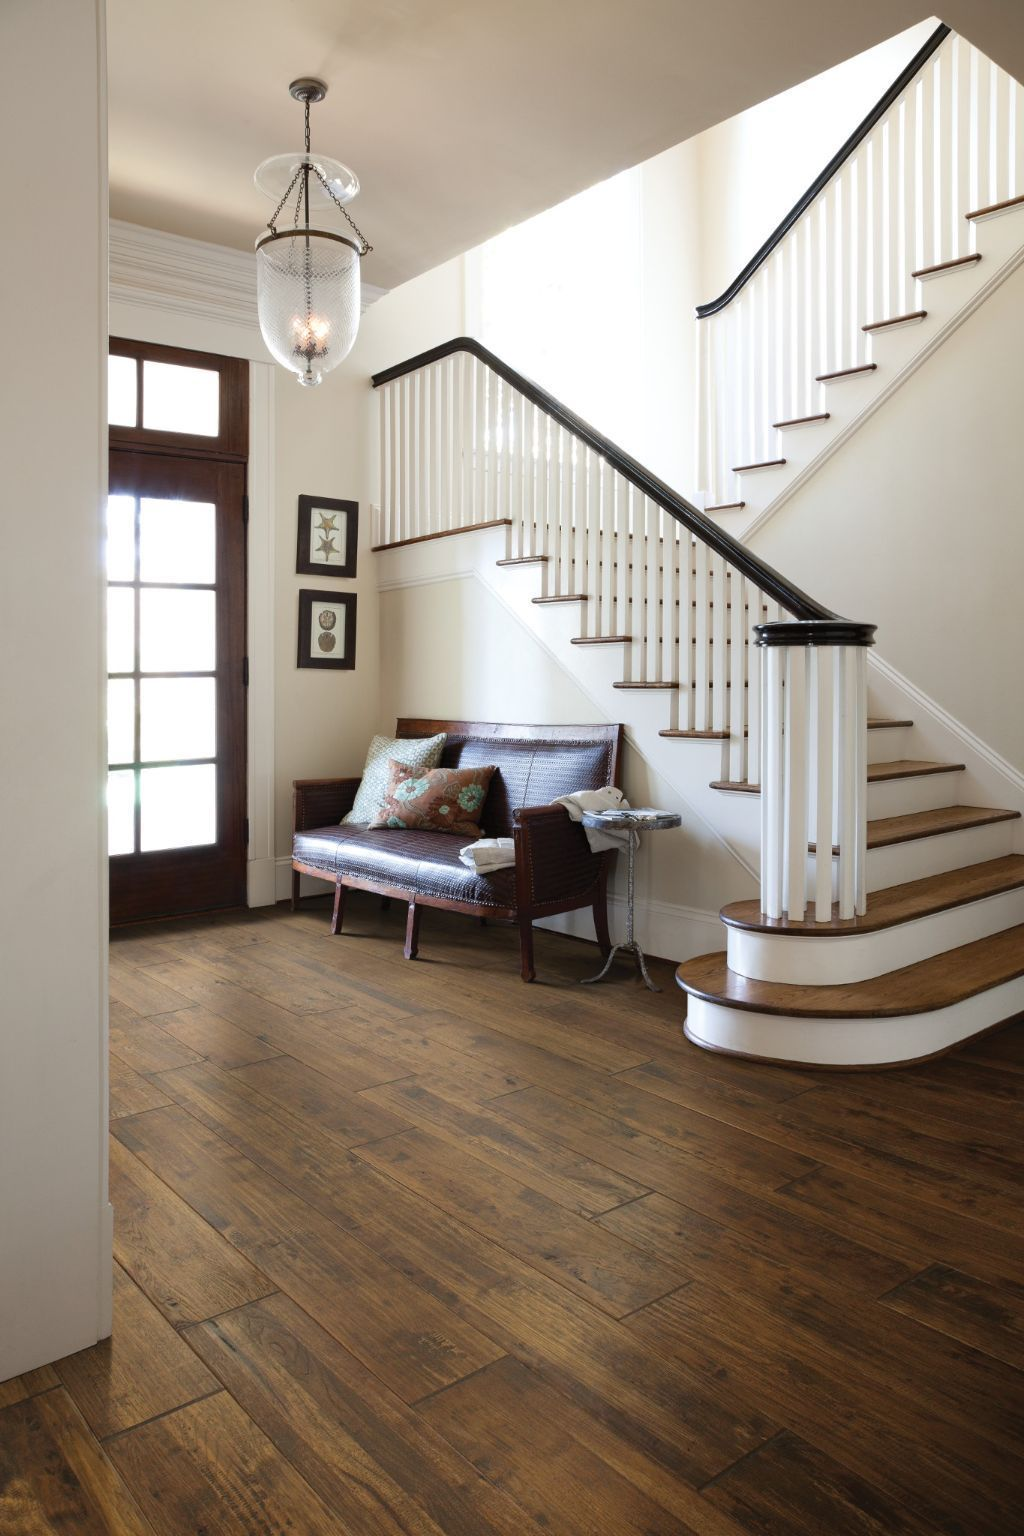 interior design #interior design for bedroom #interior design